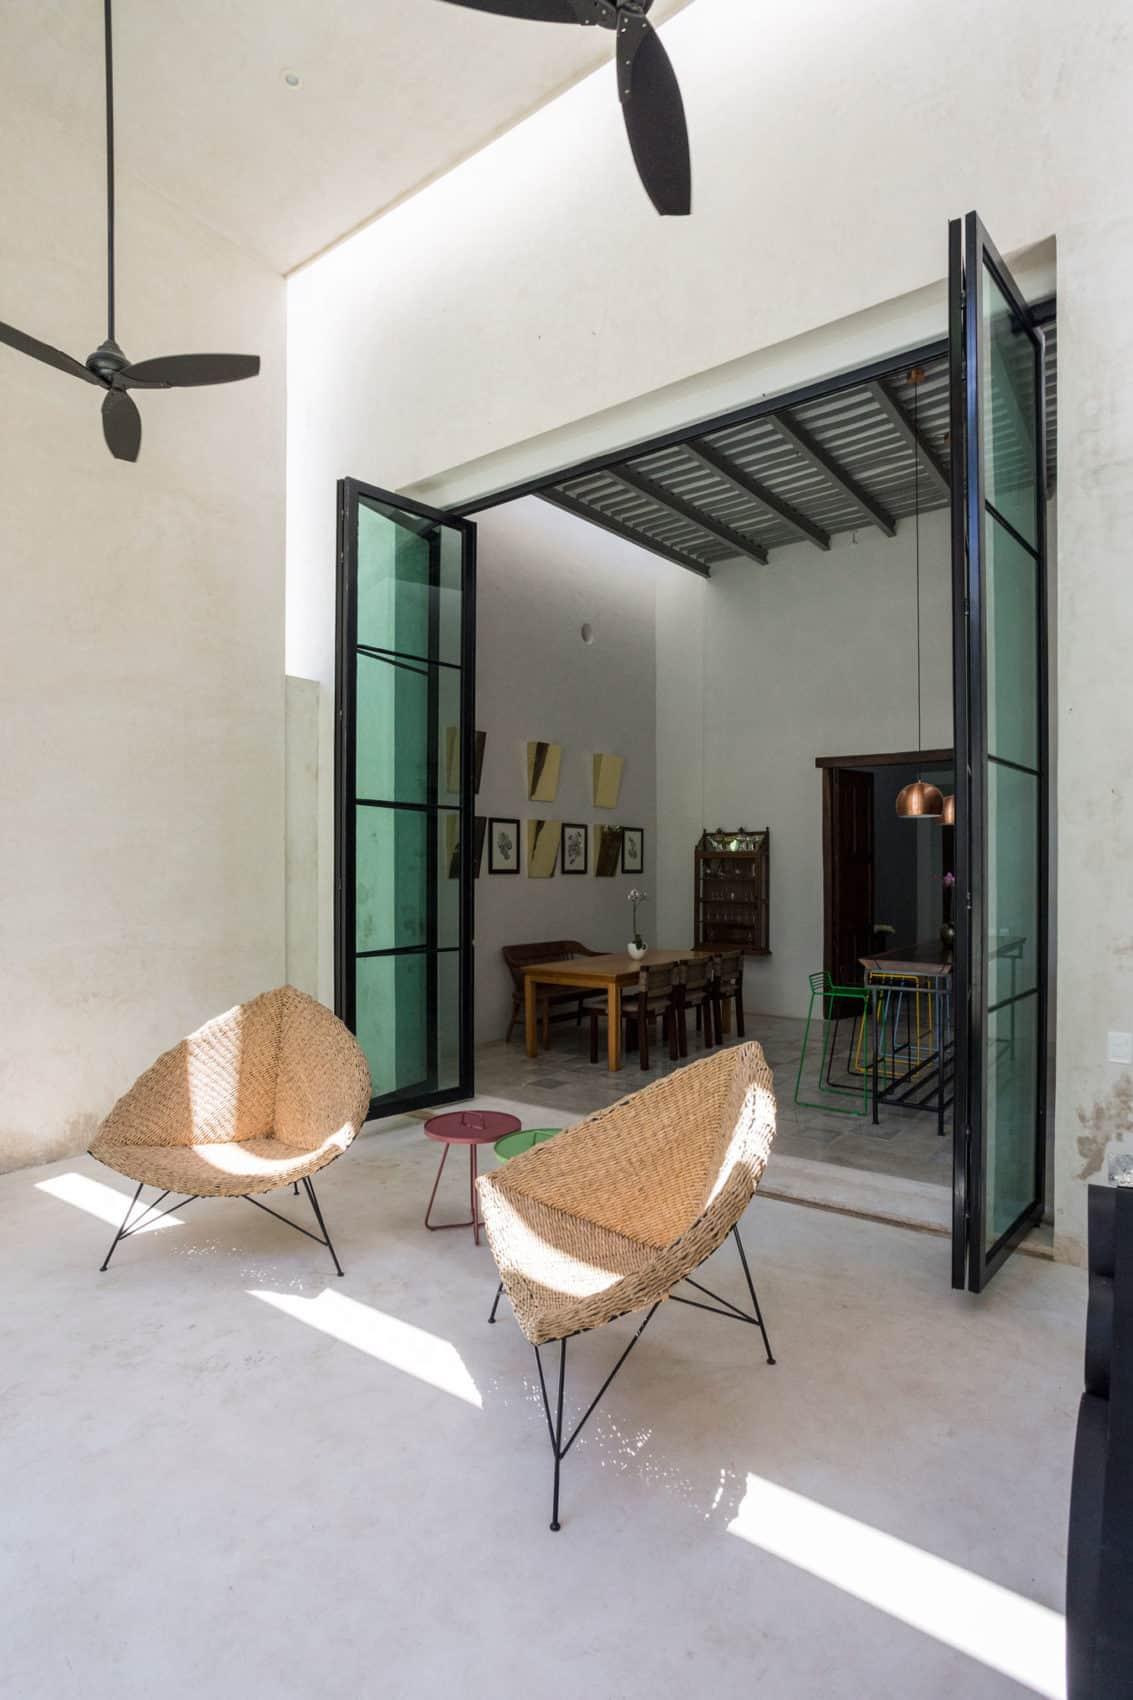 Casa del Limonero by Taller Estilo Arquitectura (7)